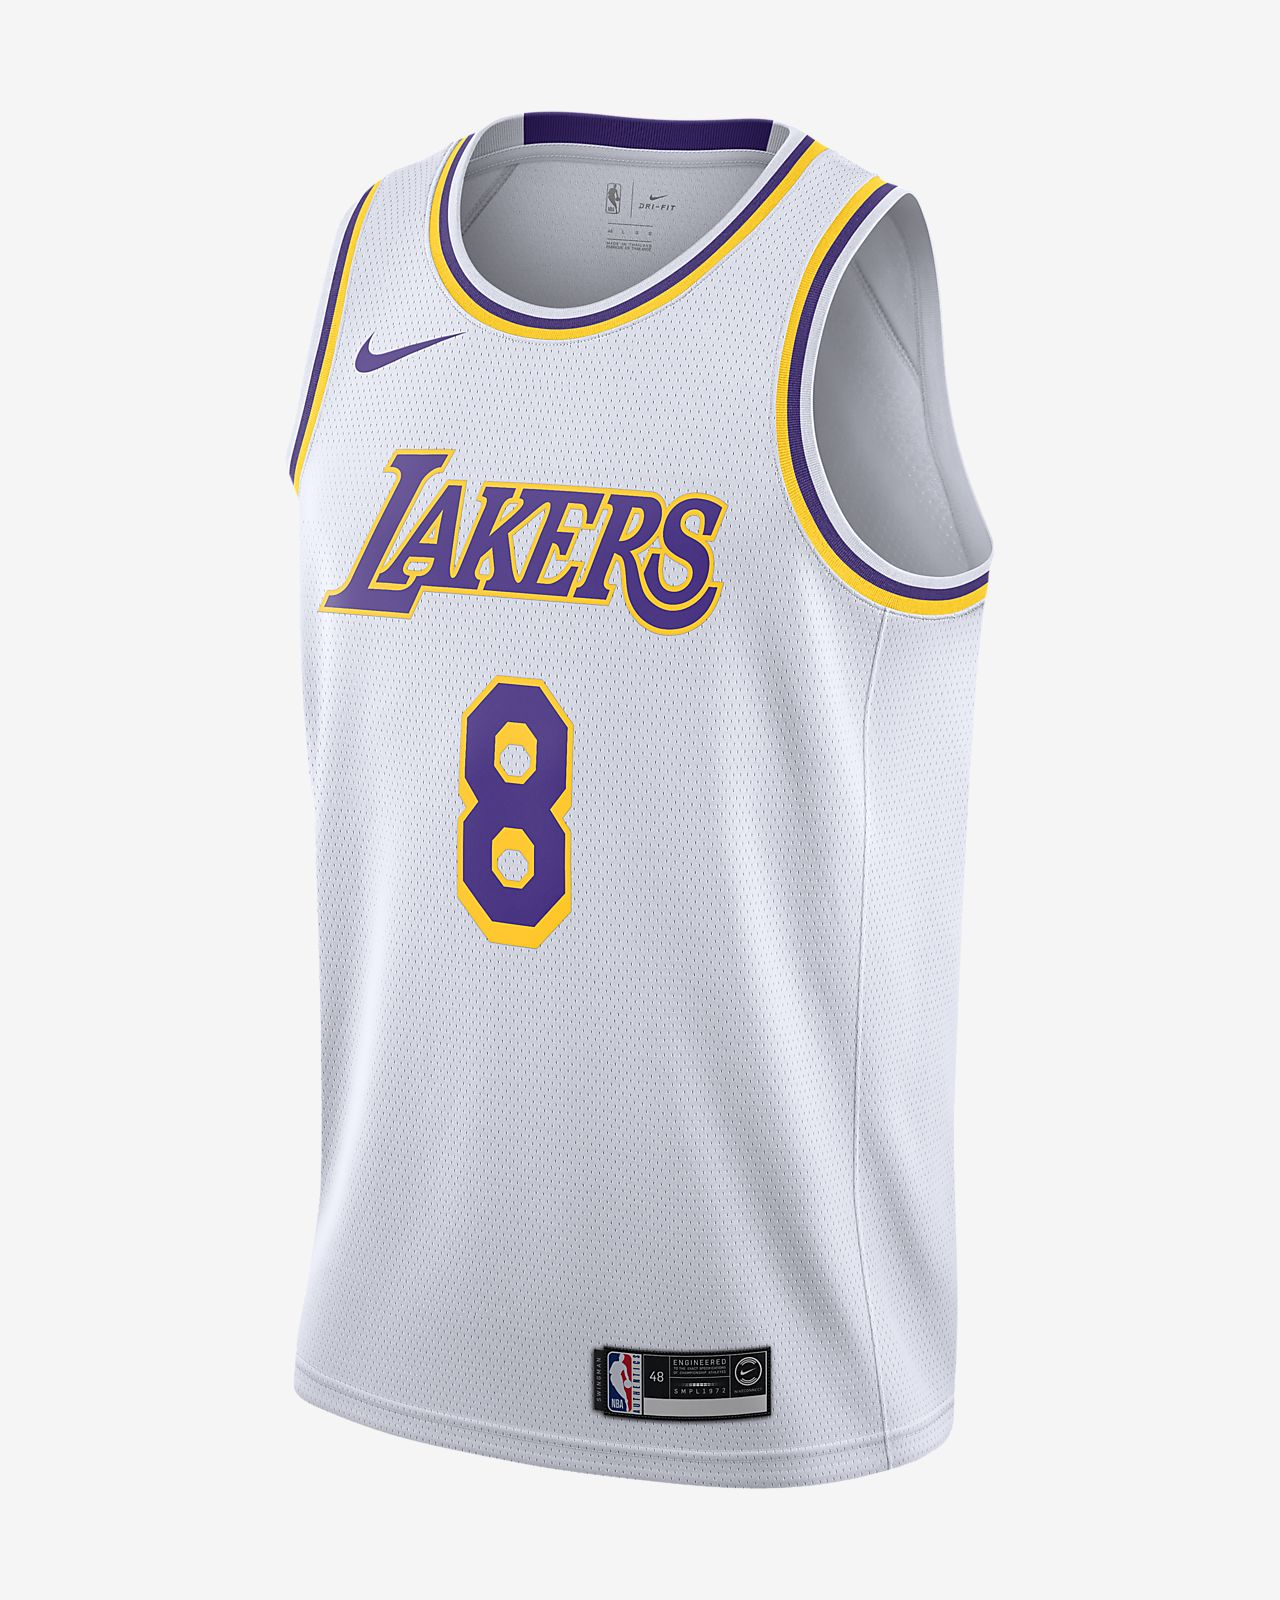 Męska koszulka Nike NBA Connected Jersey Kobe Bryant Association Edition Swingman (Los Angeles Lakers)